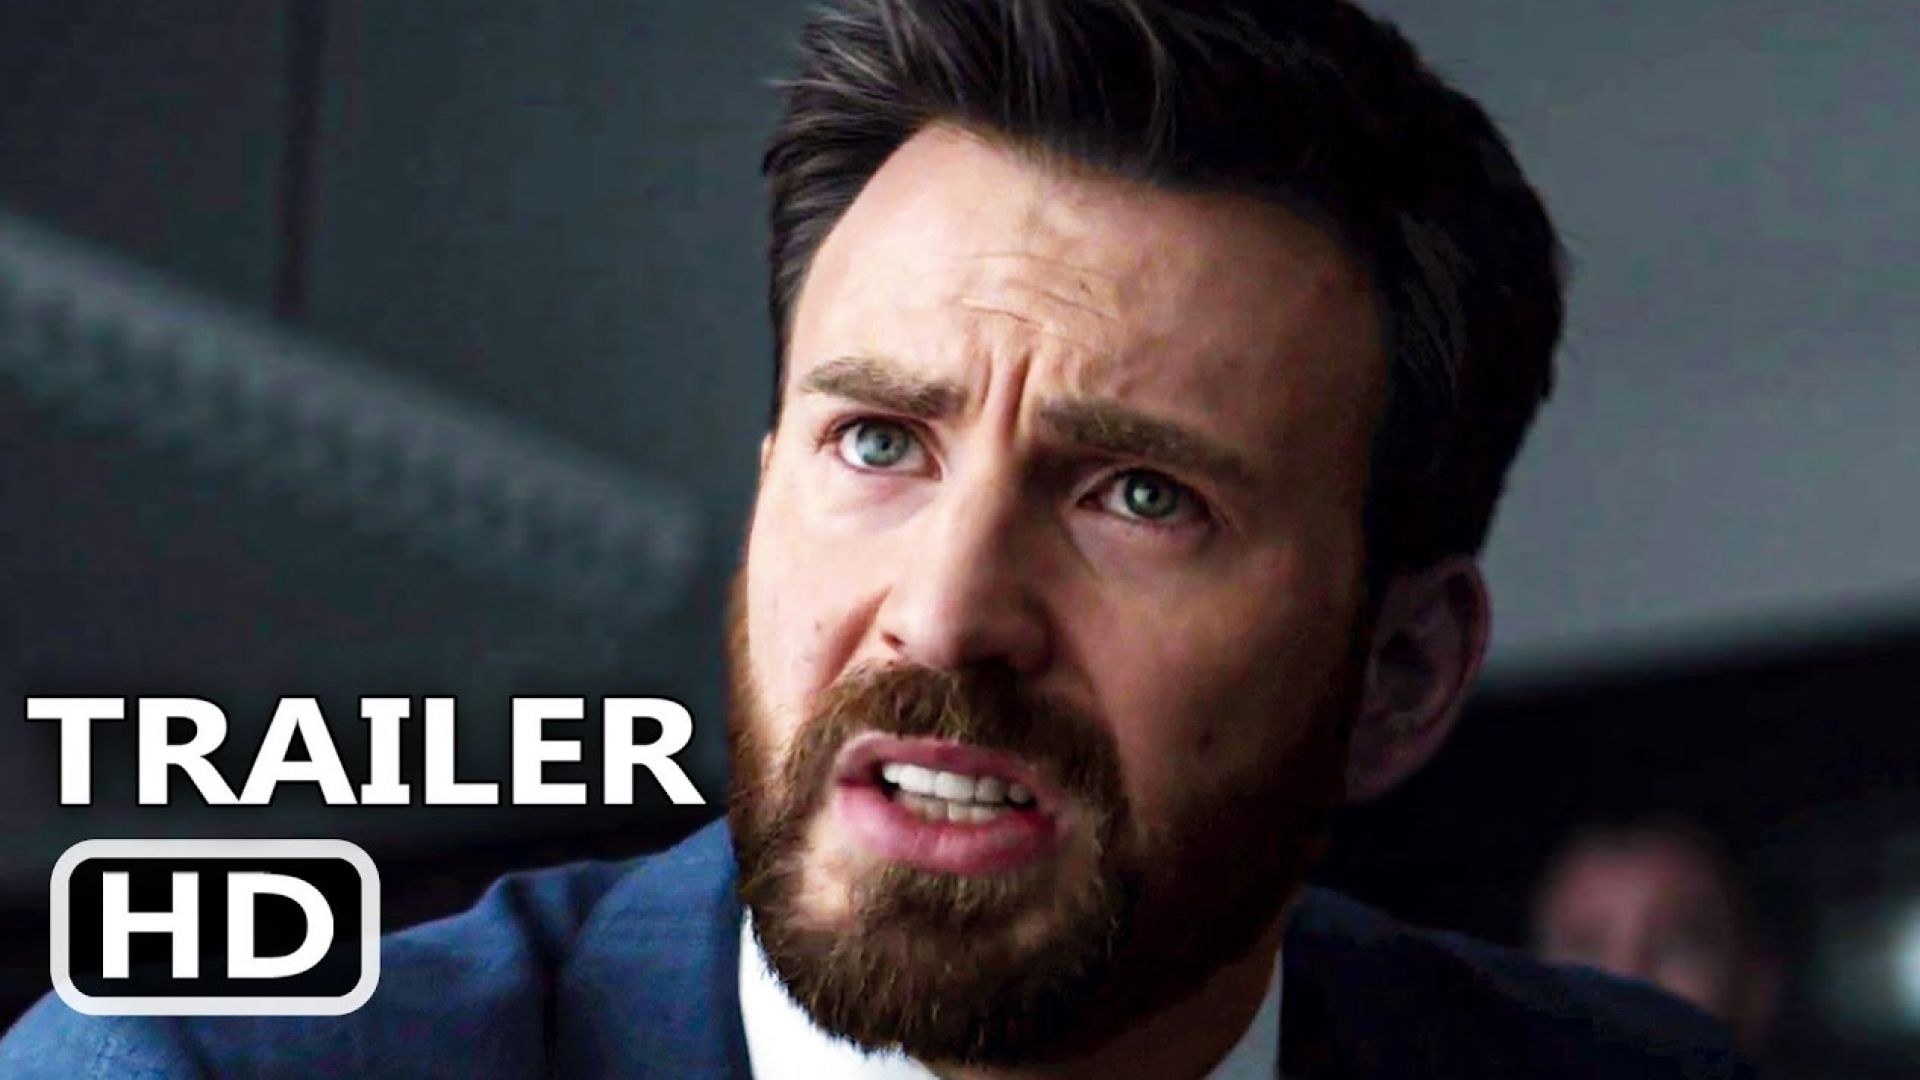 'Defending Jacob' trailer with Chris Evans (Apple TV)